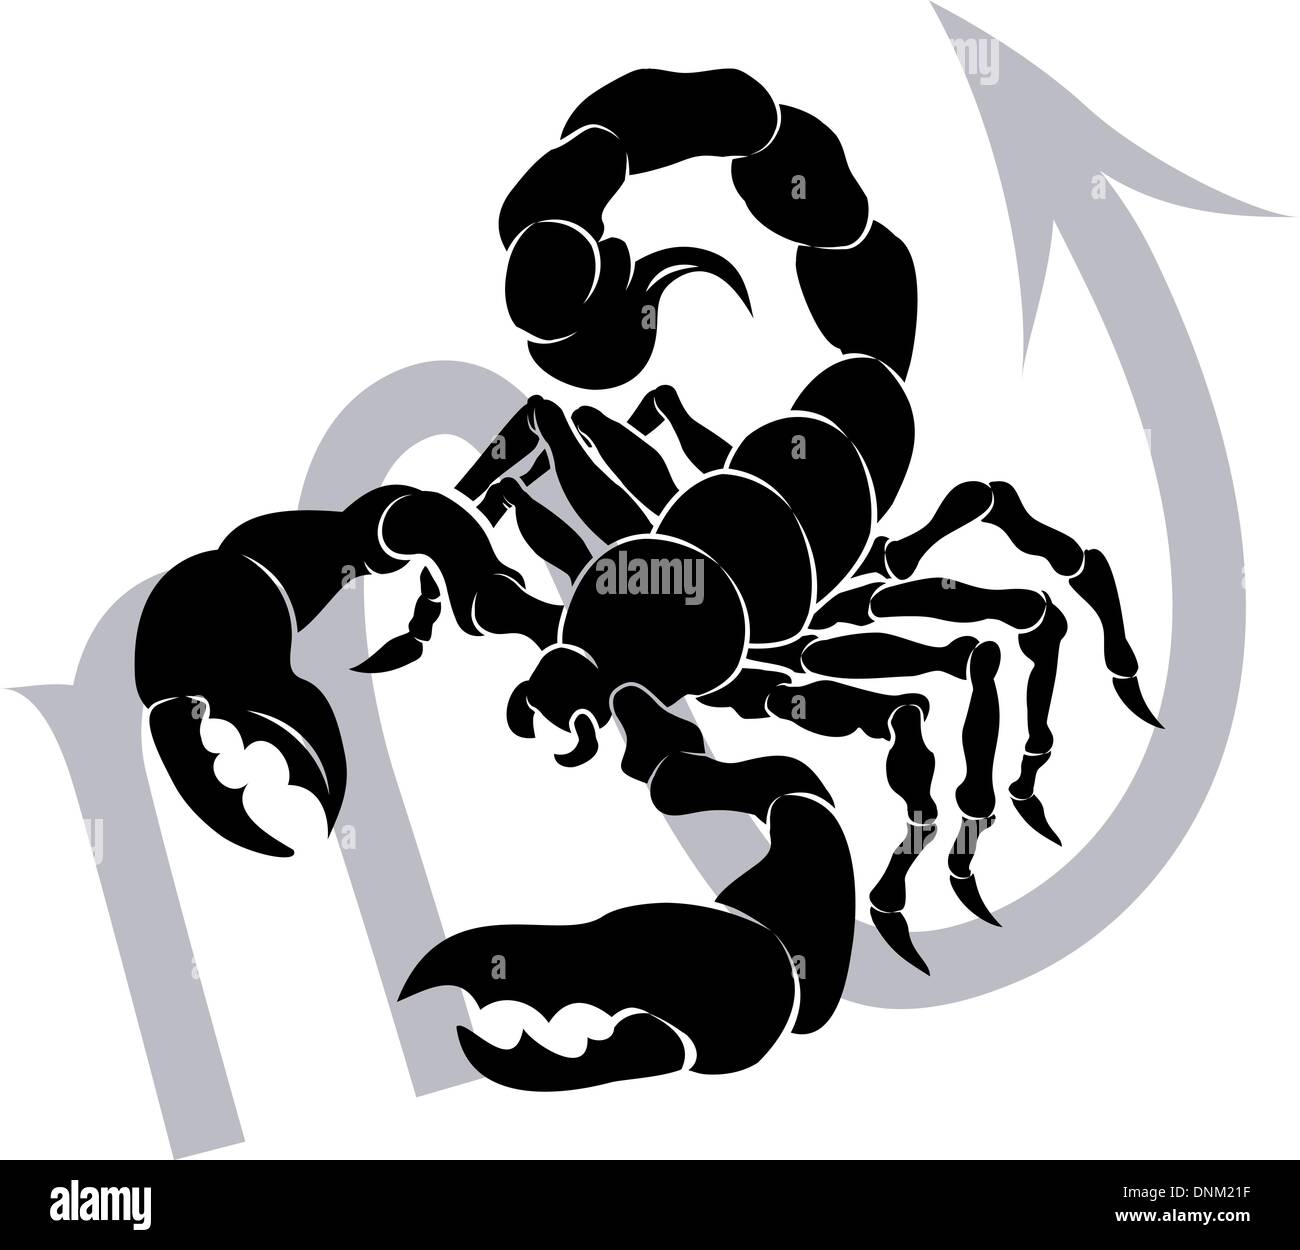 Sexuality Traits of the Zodiac Sign Scorpio